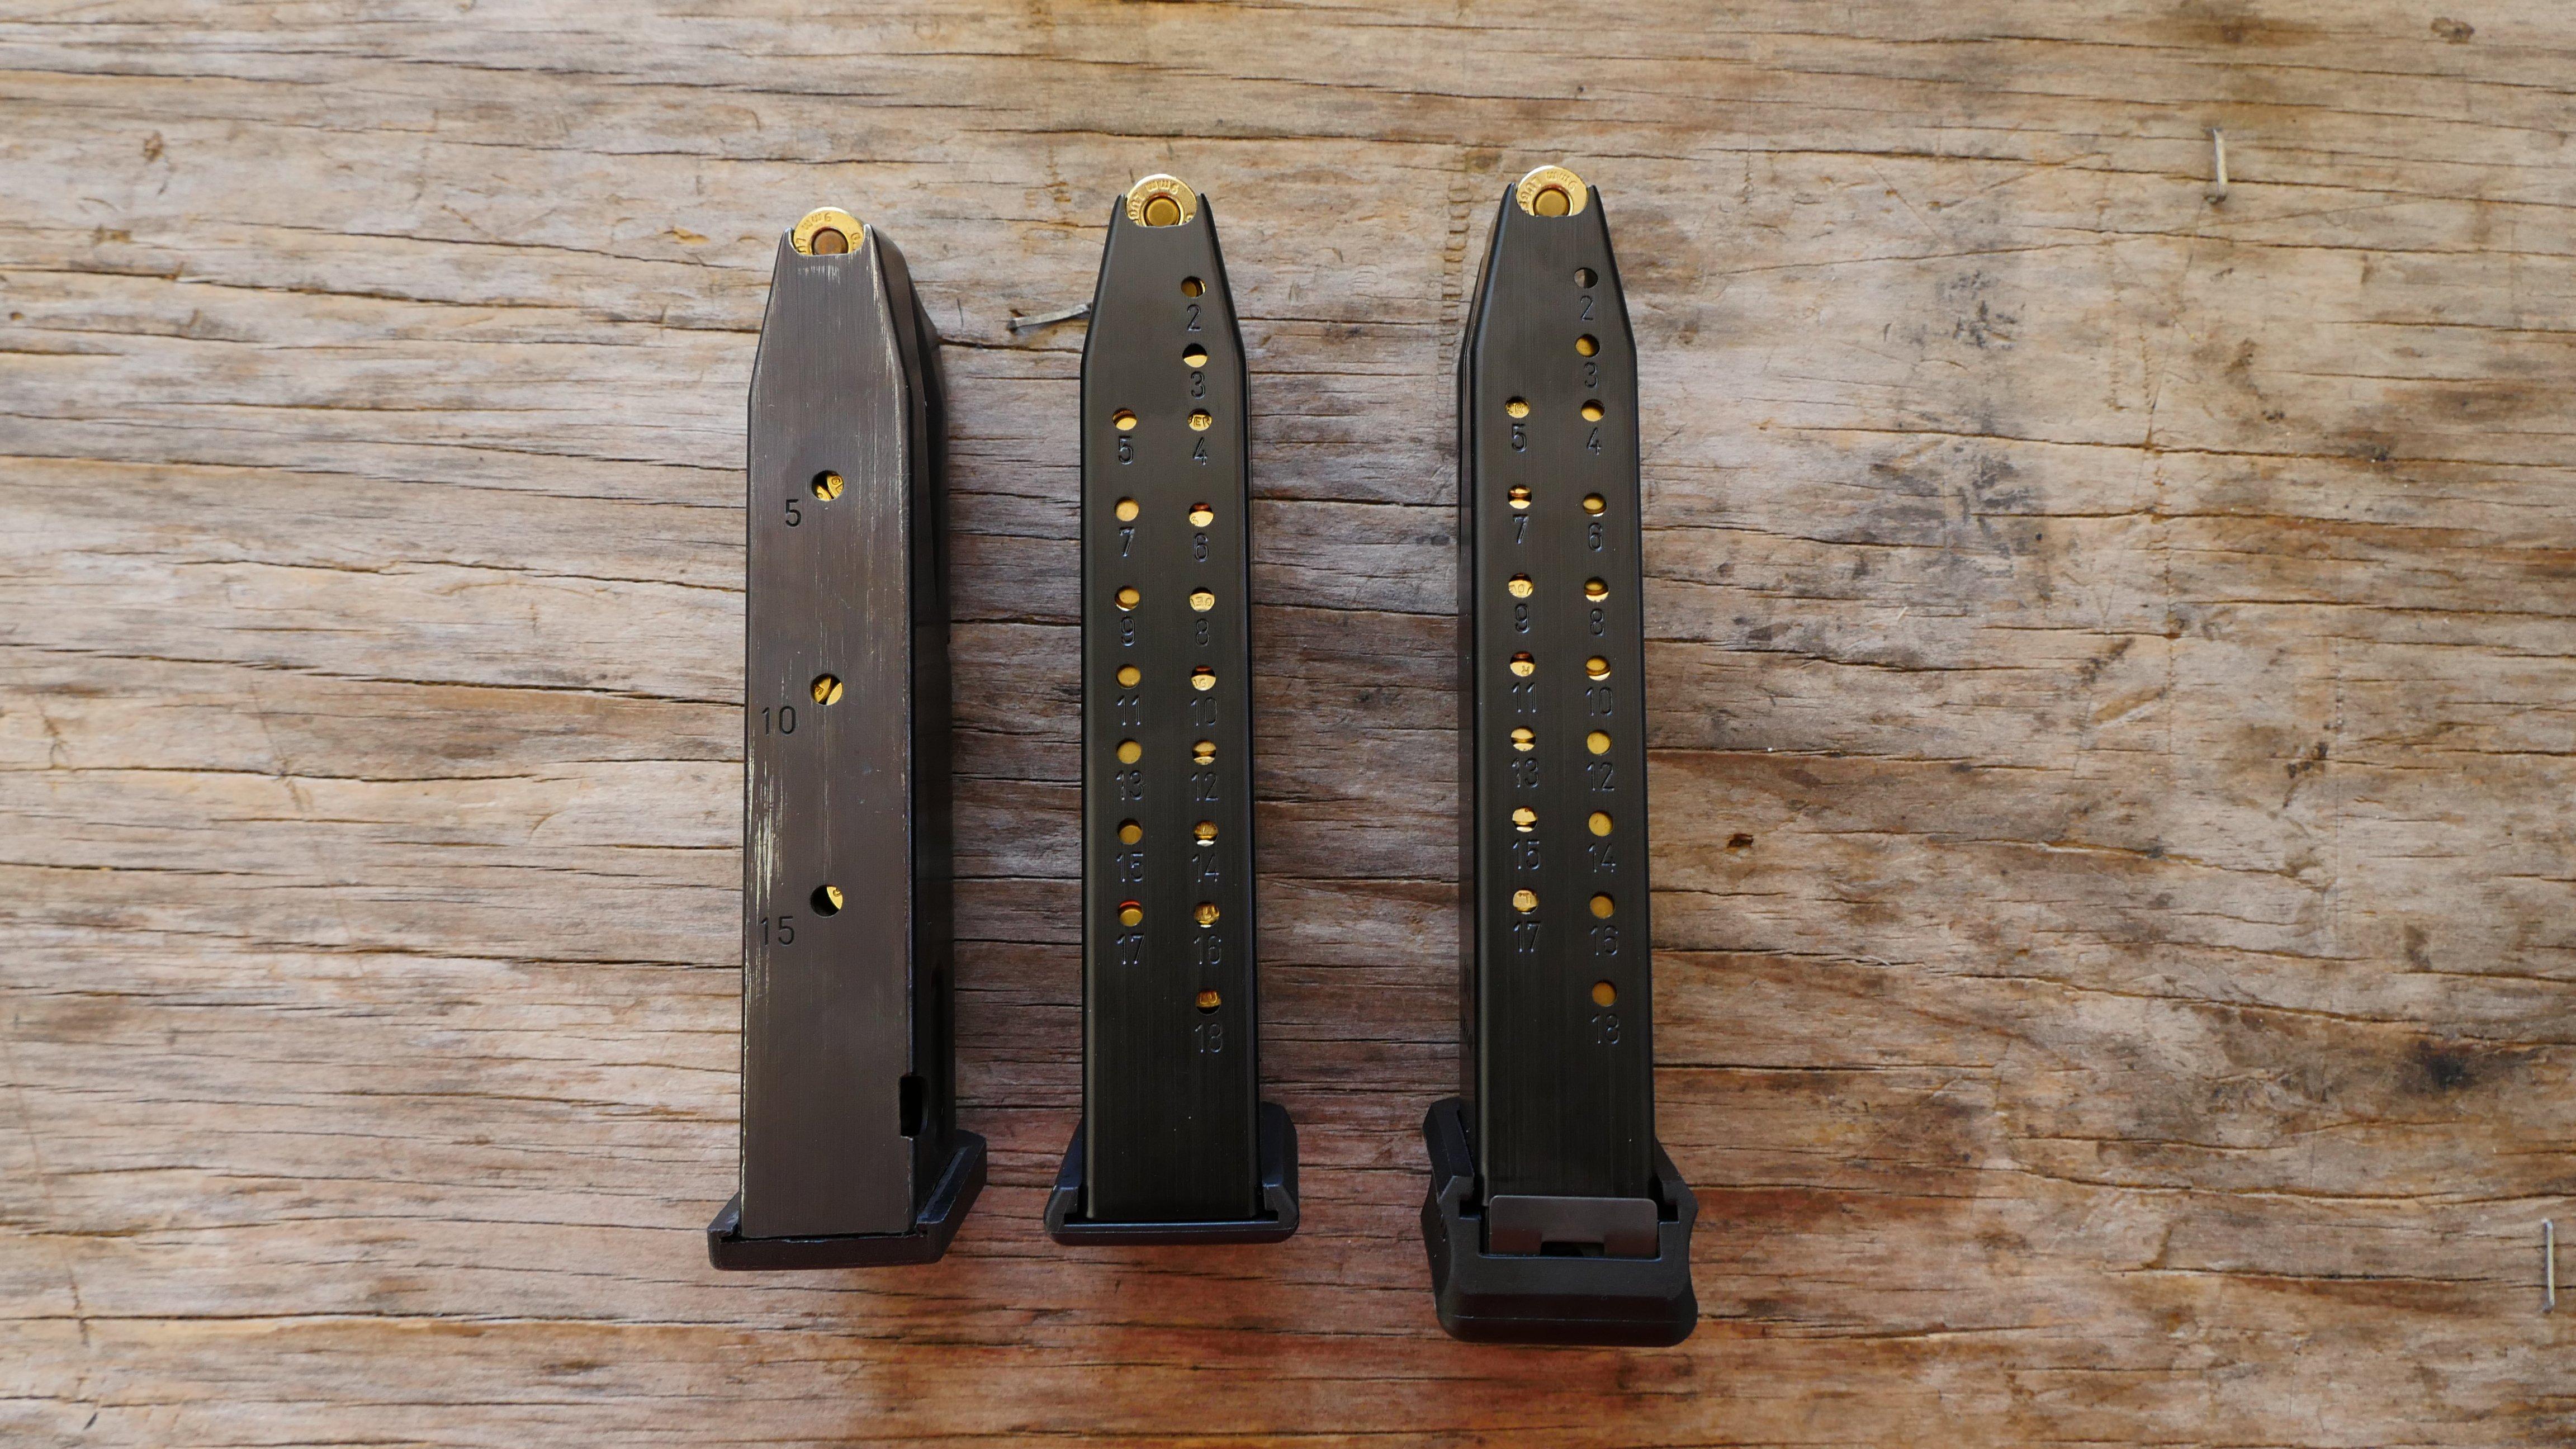 Mec-Gar Magazines For CZ75 and Beretta 92FS | Review